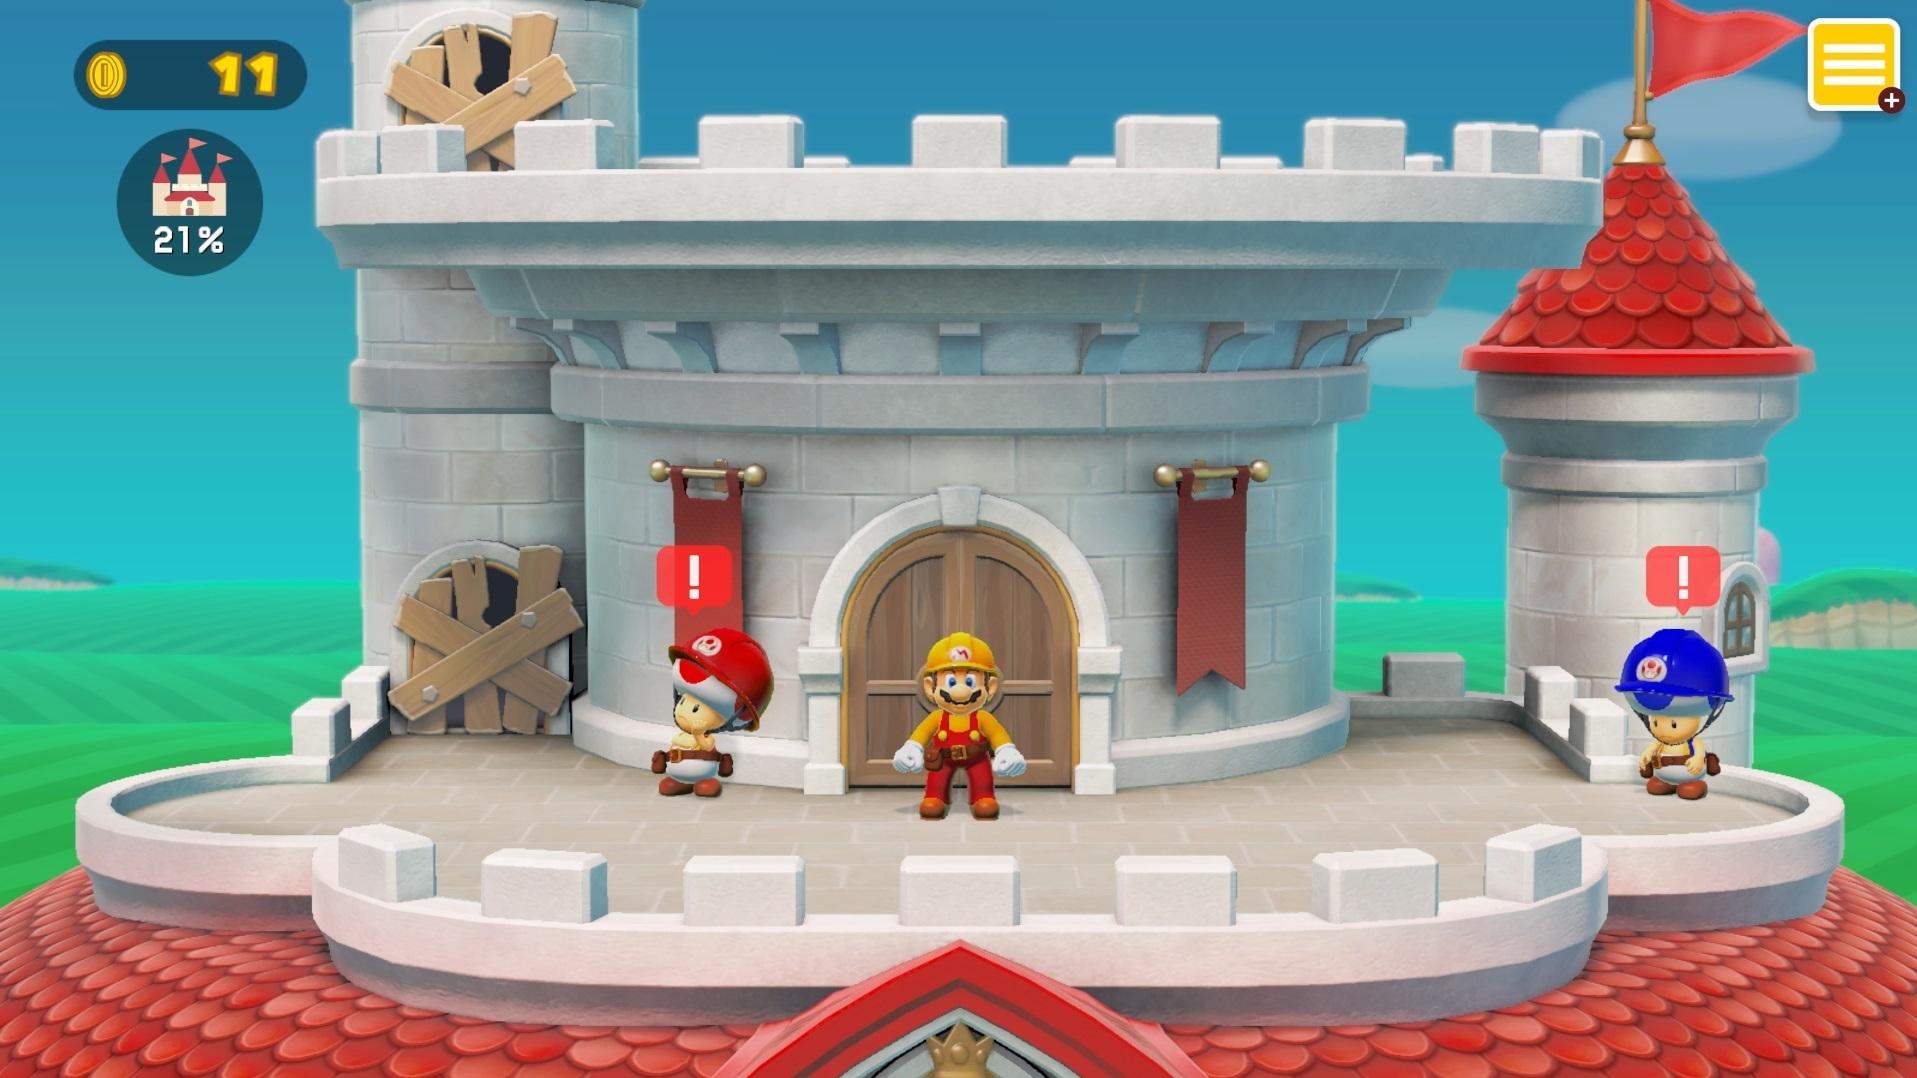 'Super Mario Maker 2' Is A Loving Ode To Fan Communities